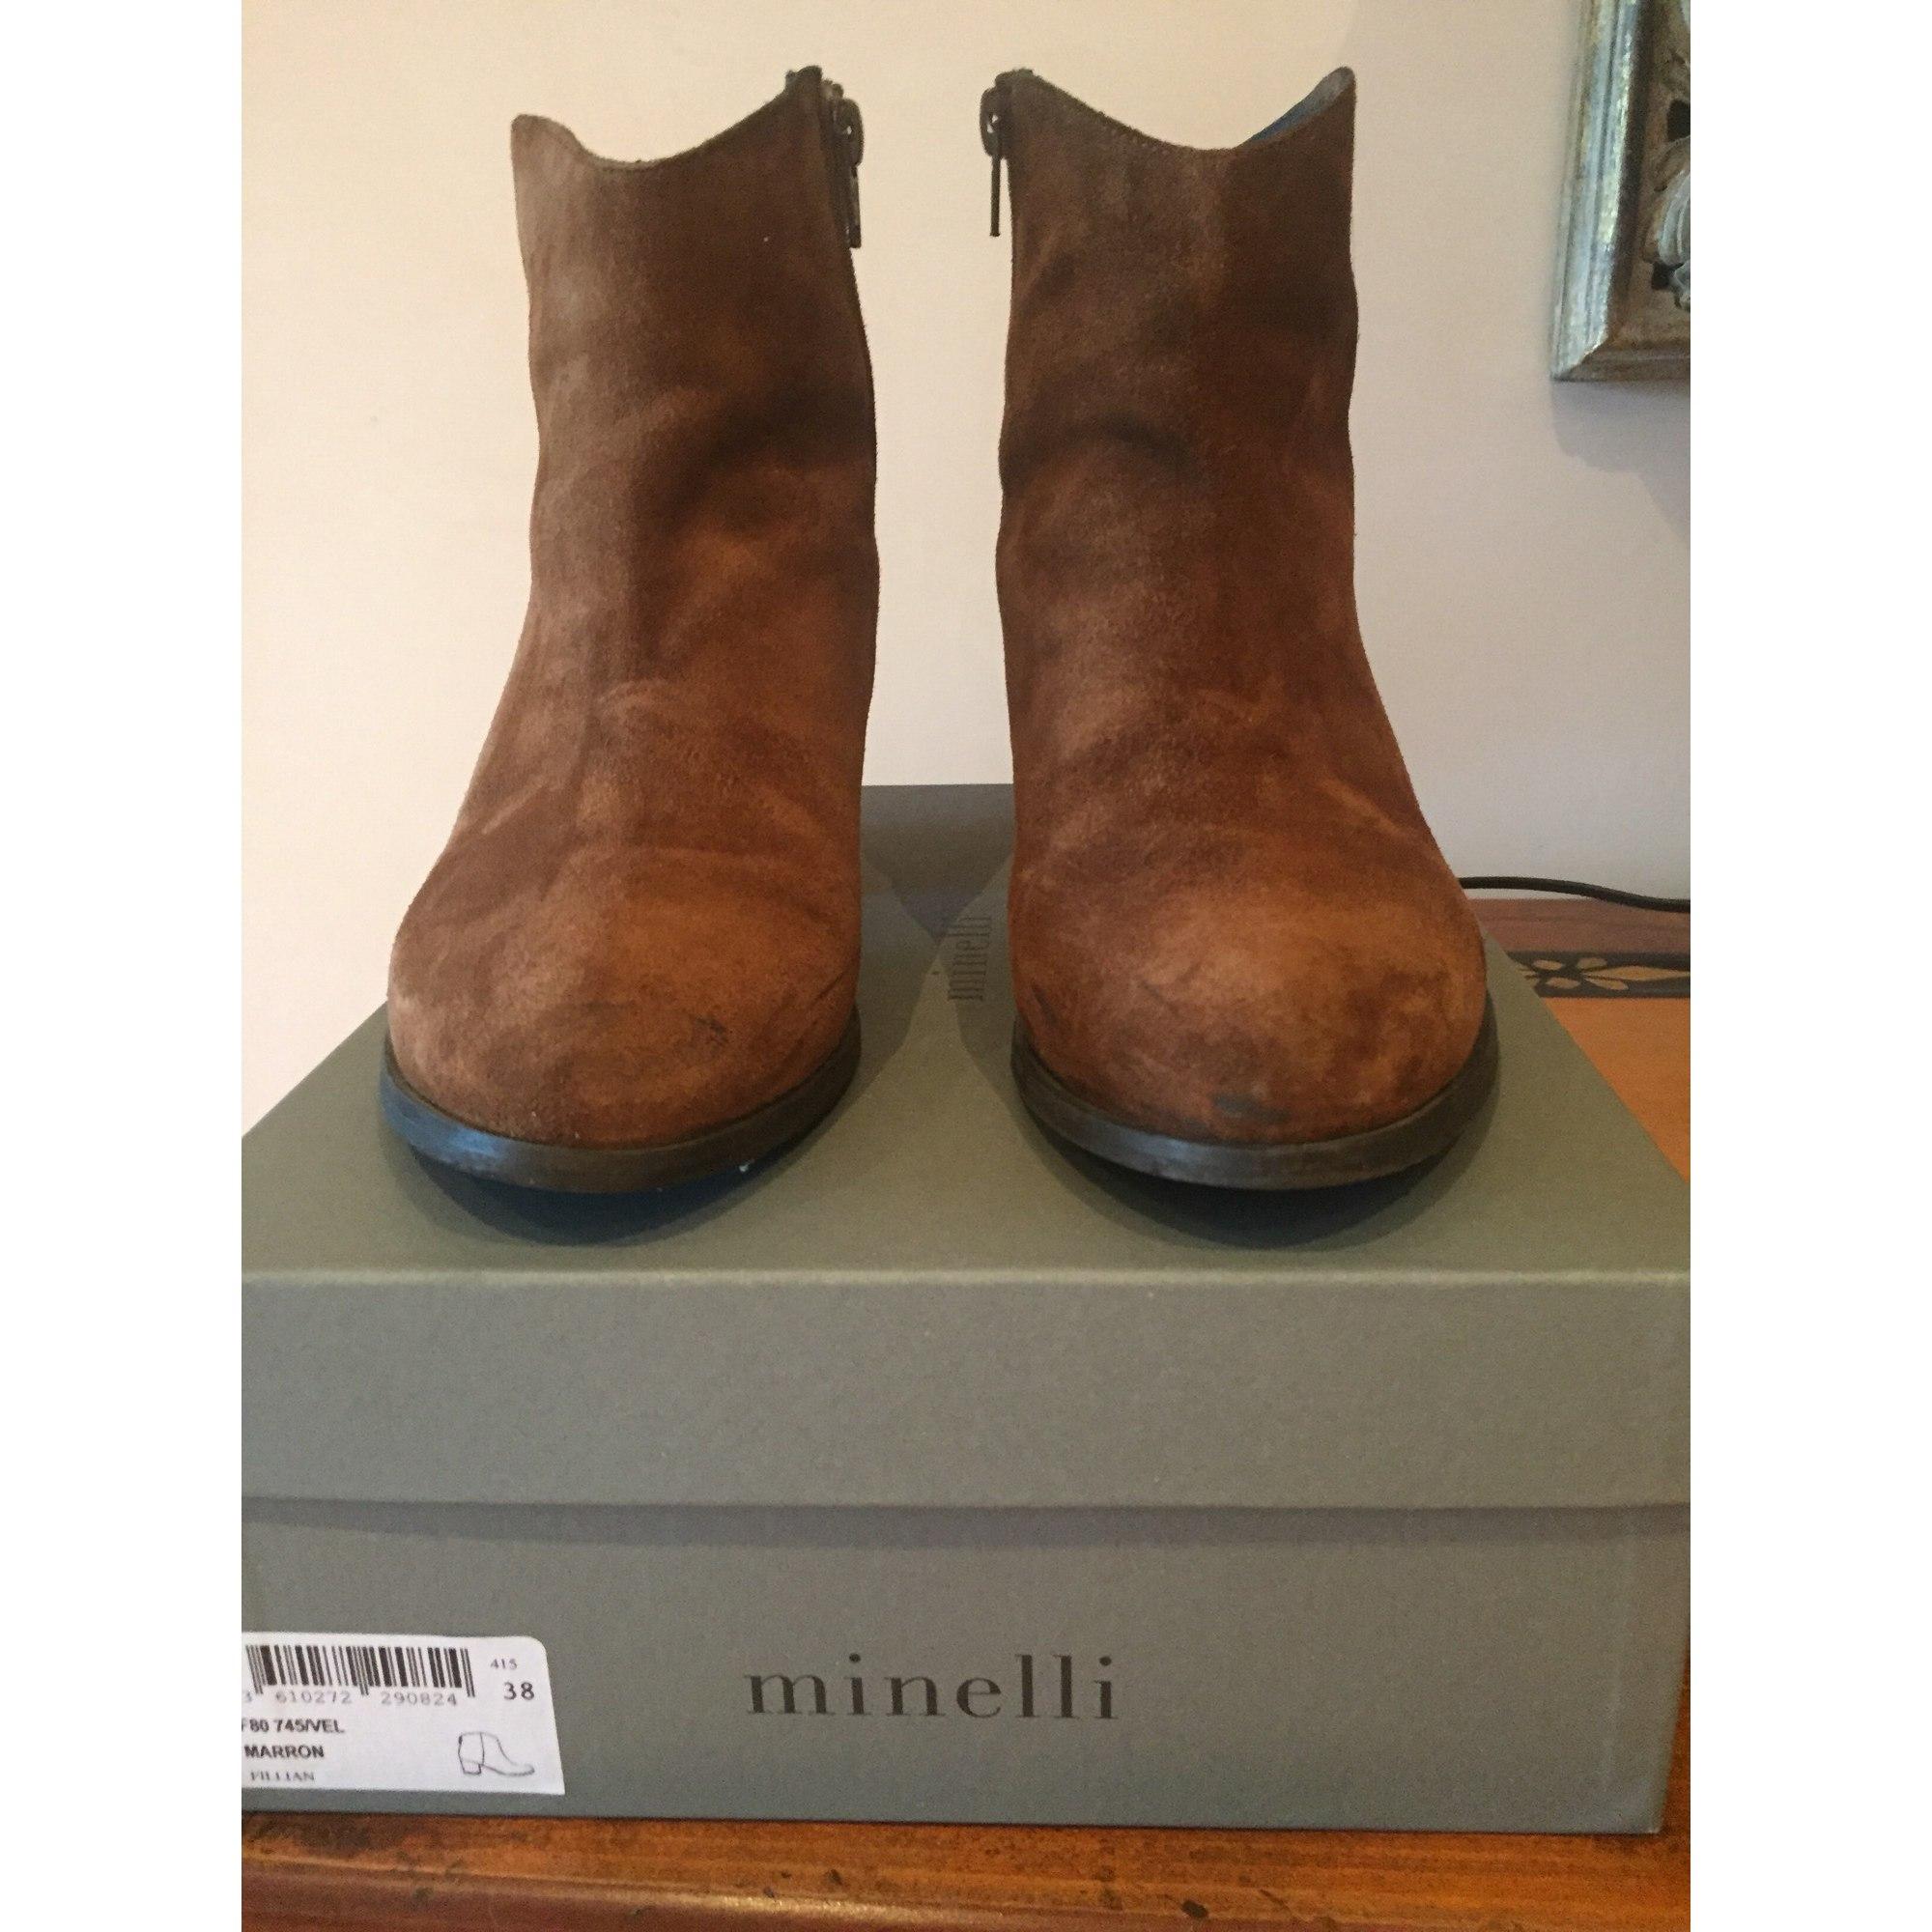 Santiags, bottines, low MINELLI Stiefel cowboy MINELLI low 38 marron 7839092 ff4e23